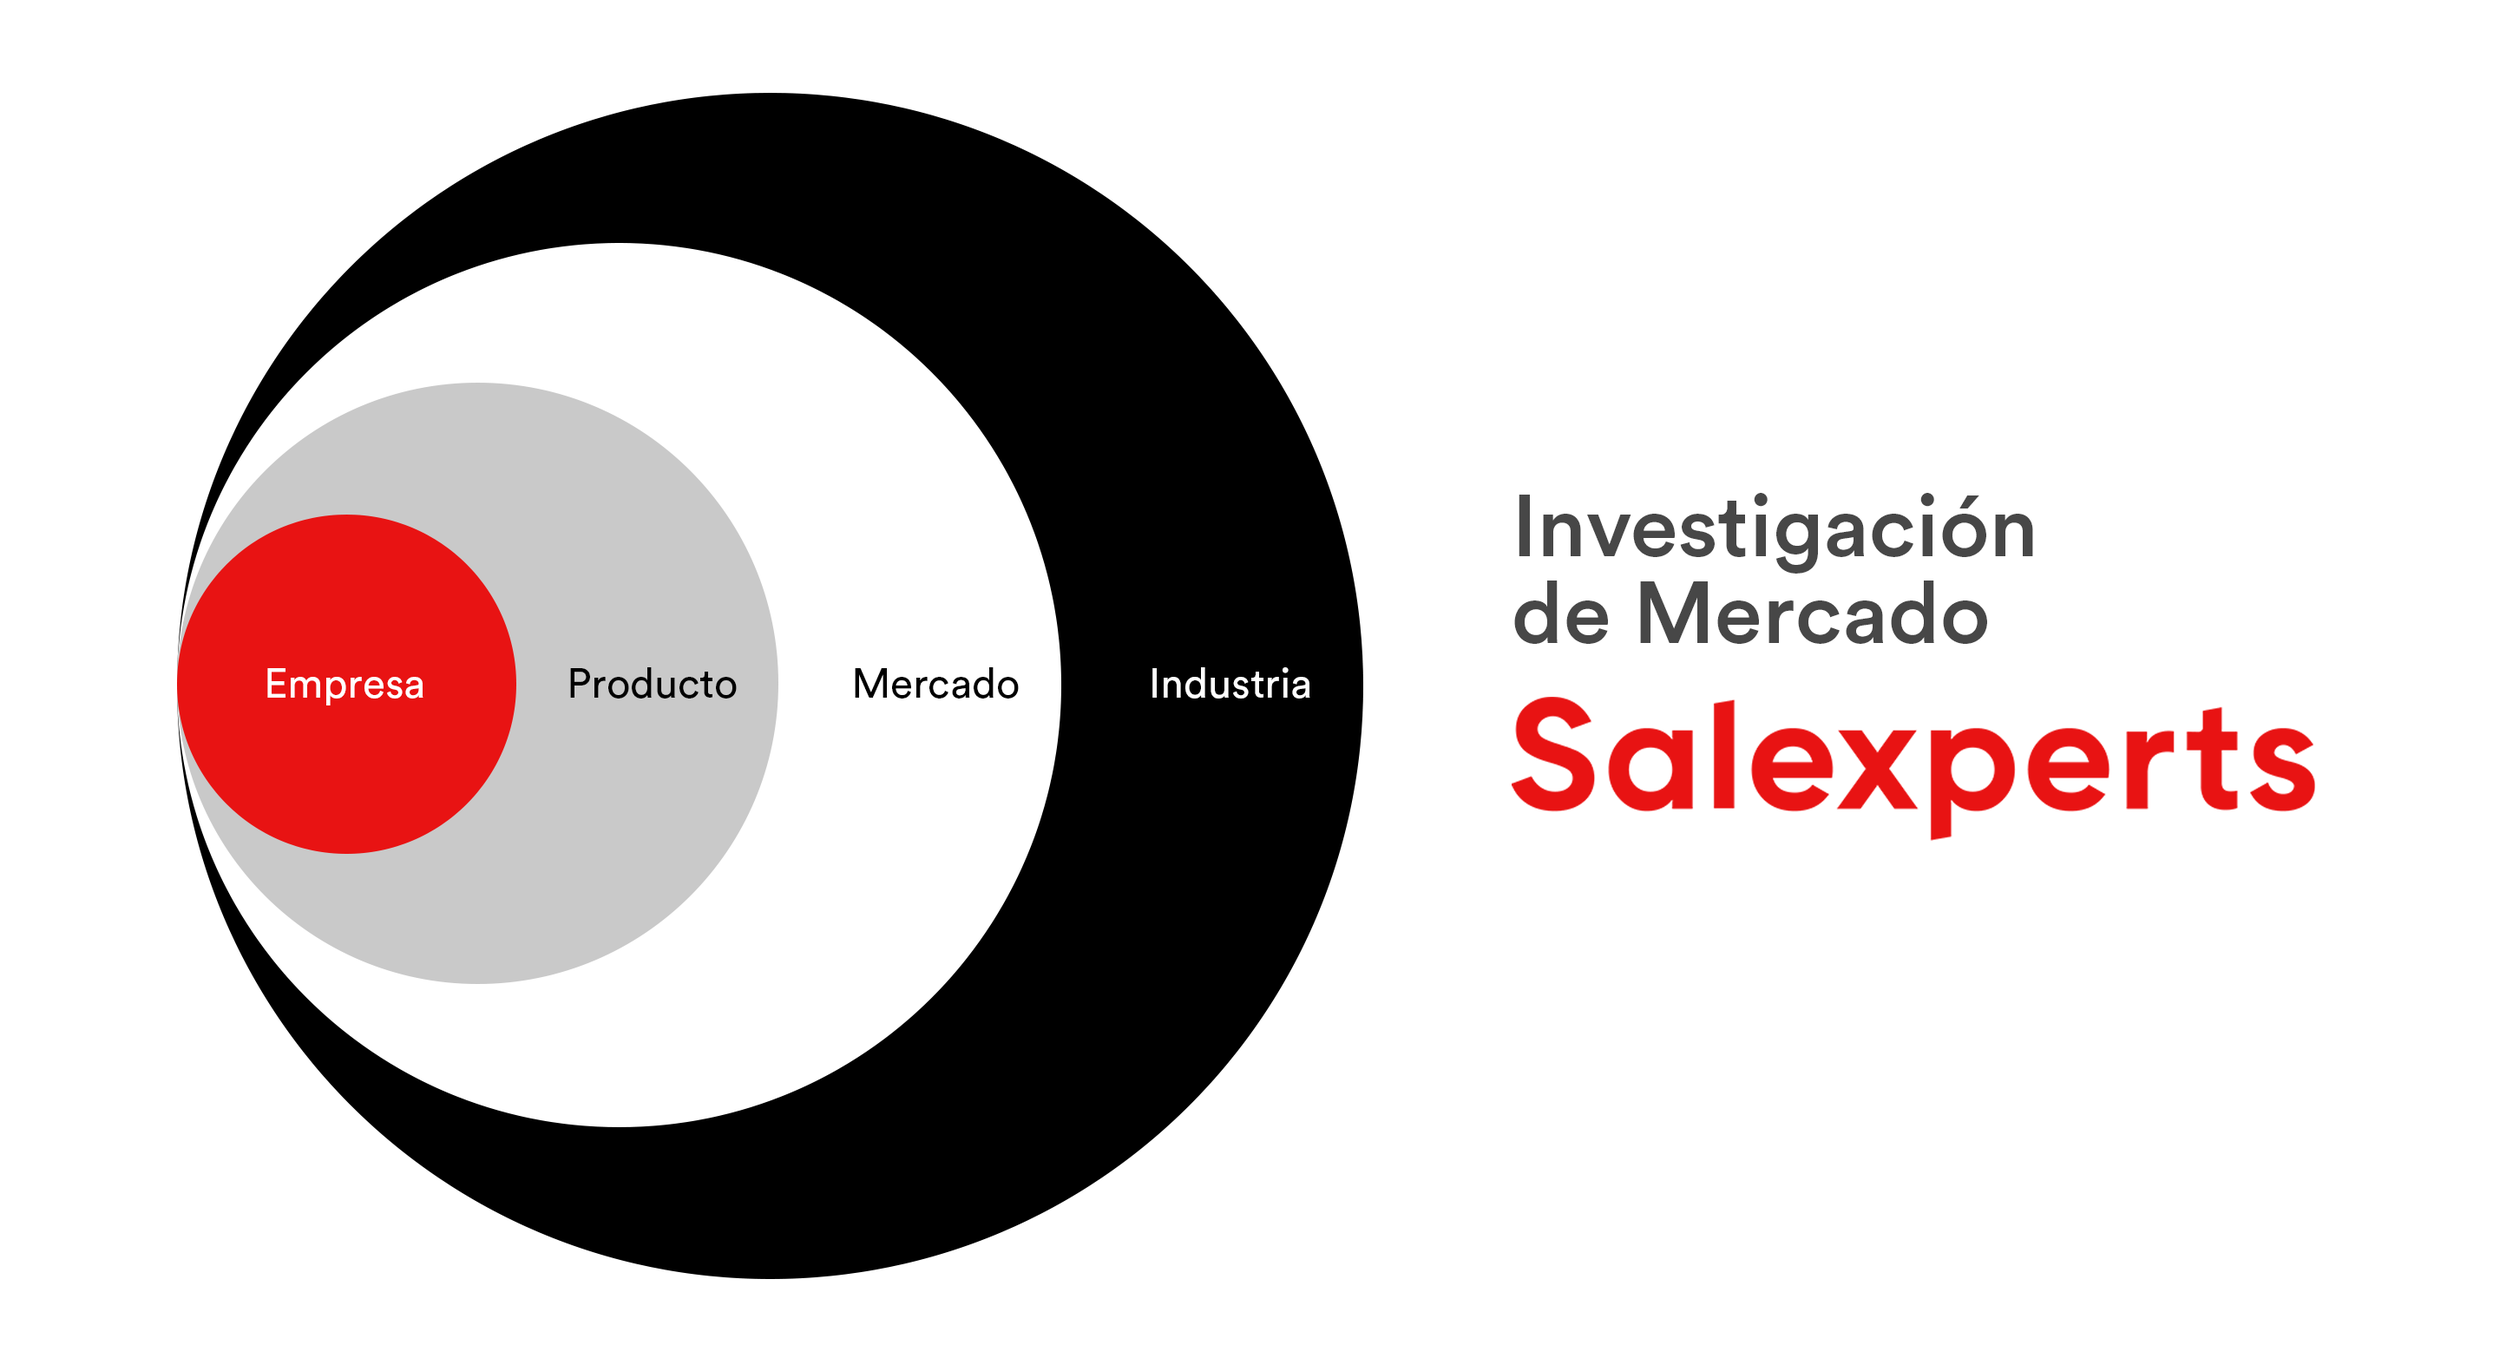 Investigacion_Salexperts_1.png